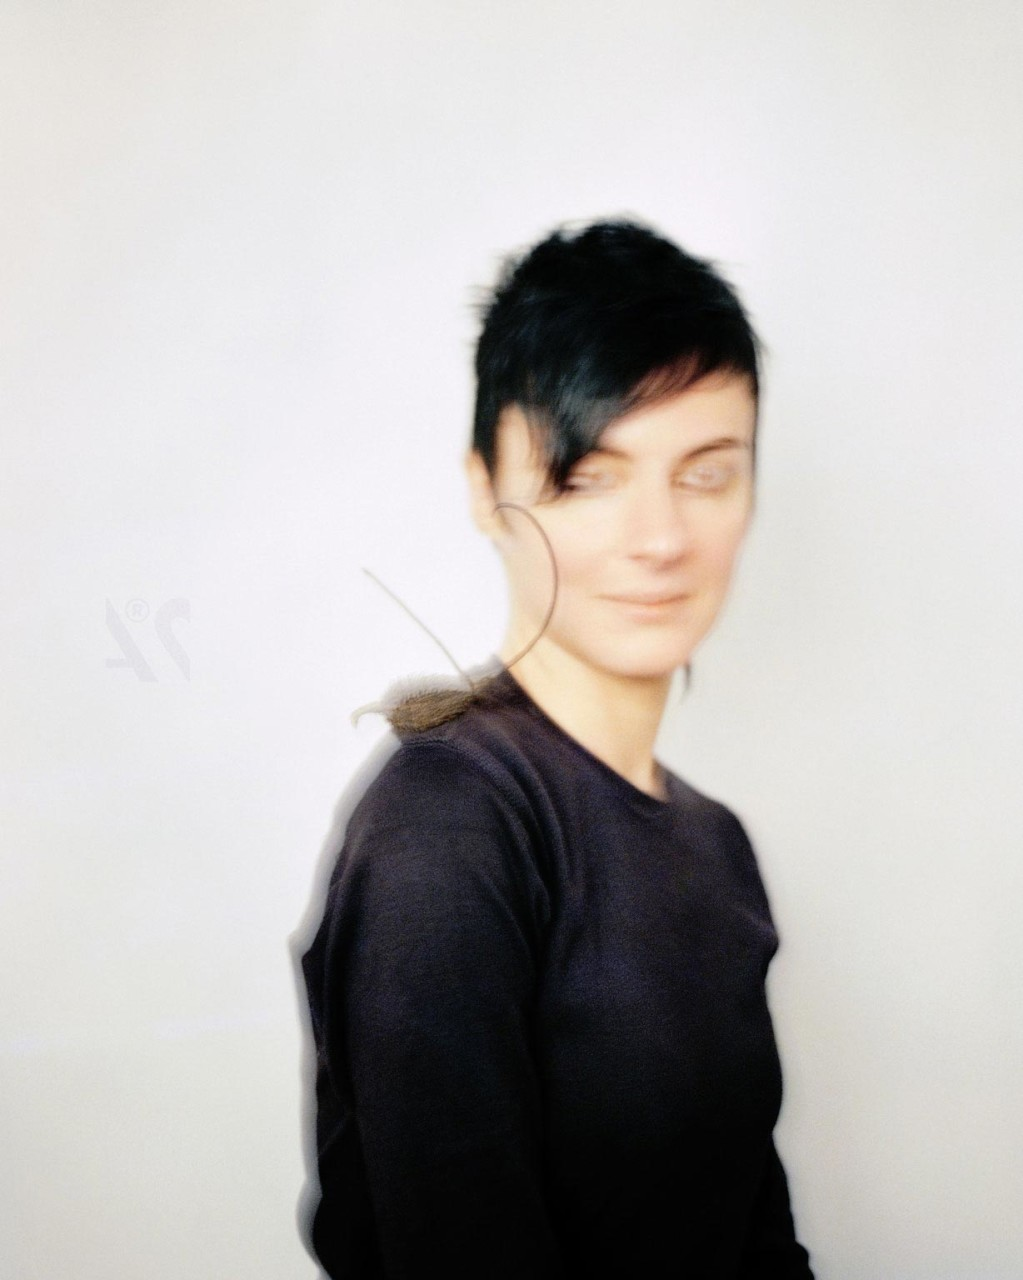 Natalja, 2009